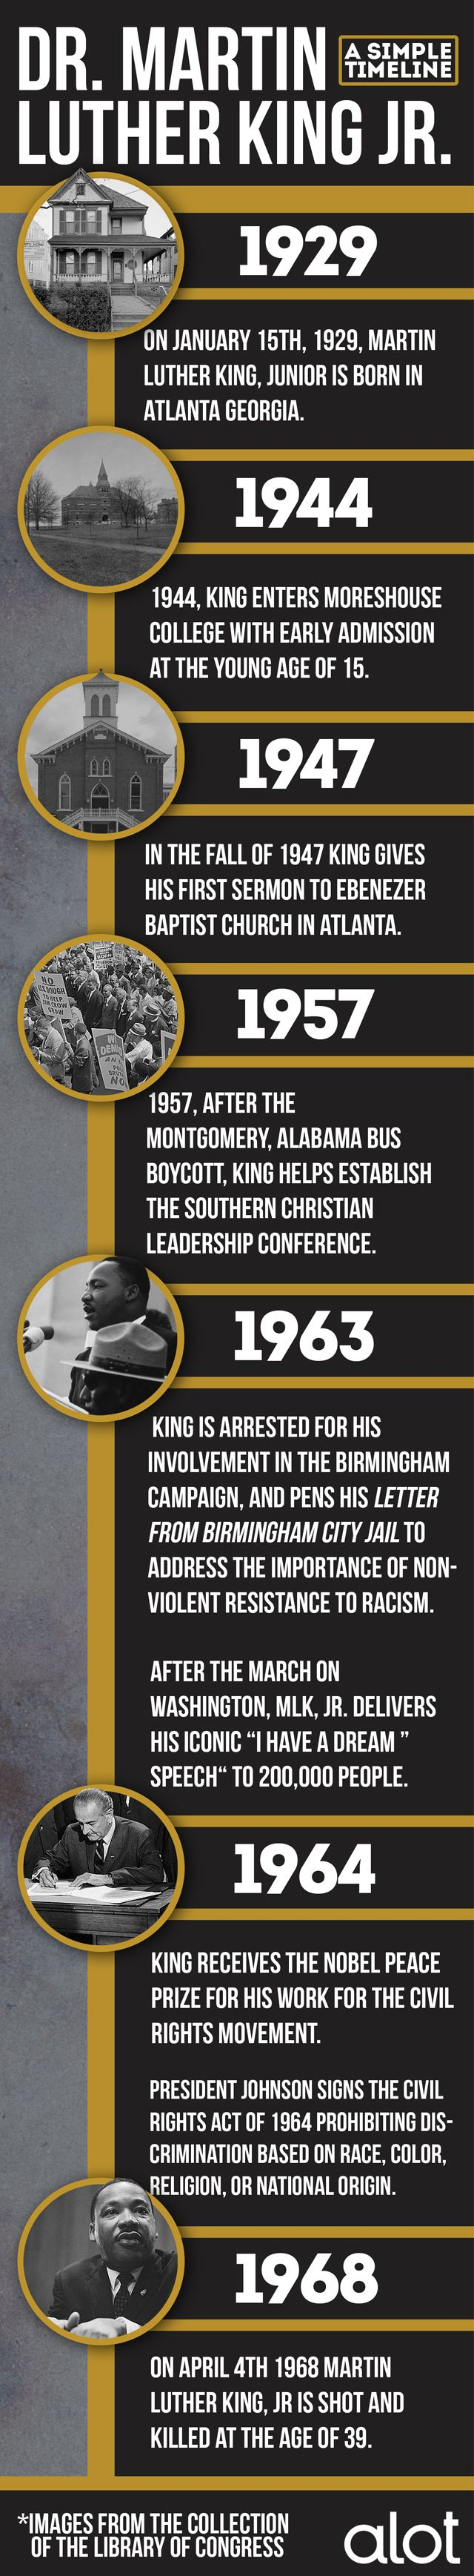 Martin Luther King, Junior: A Timeline